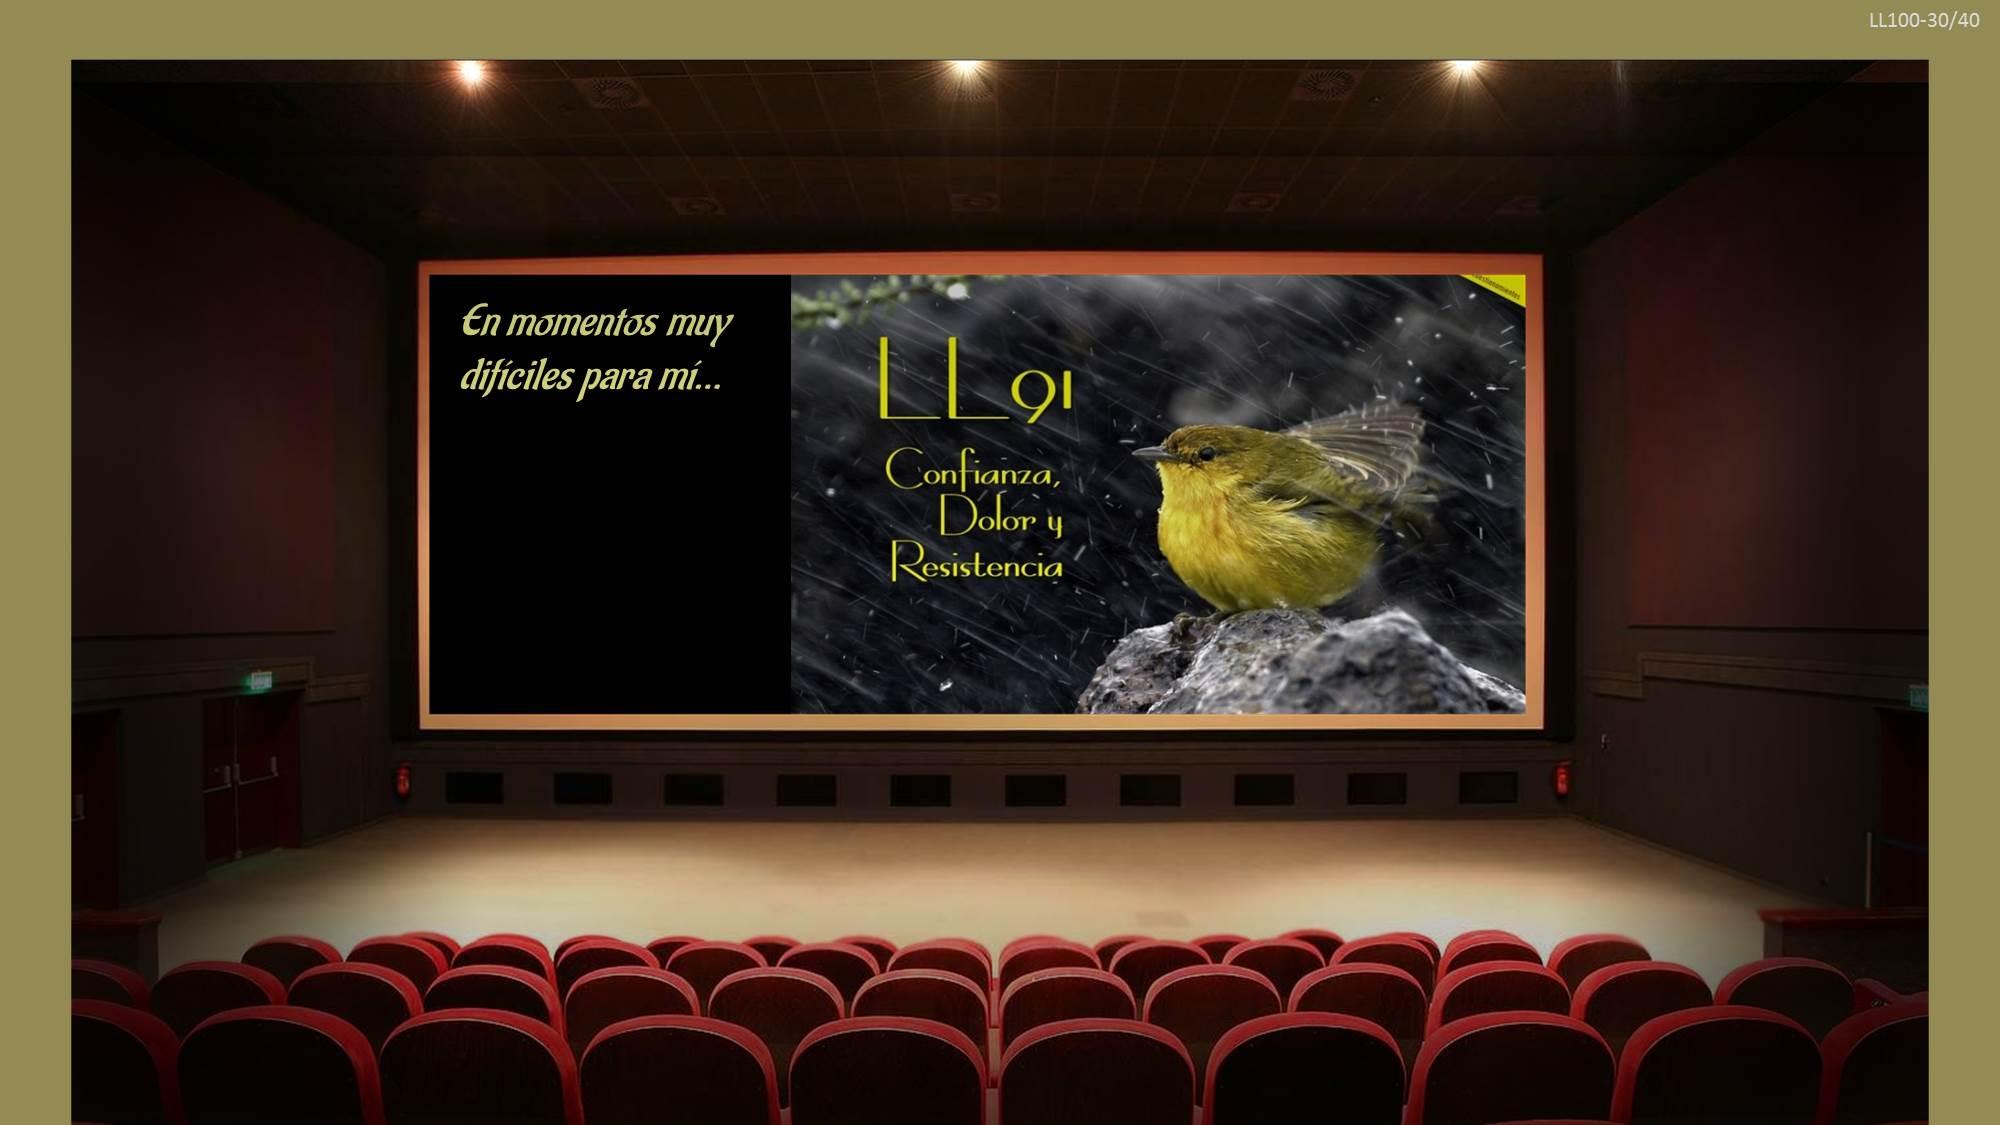 LL100_30